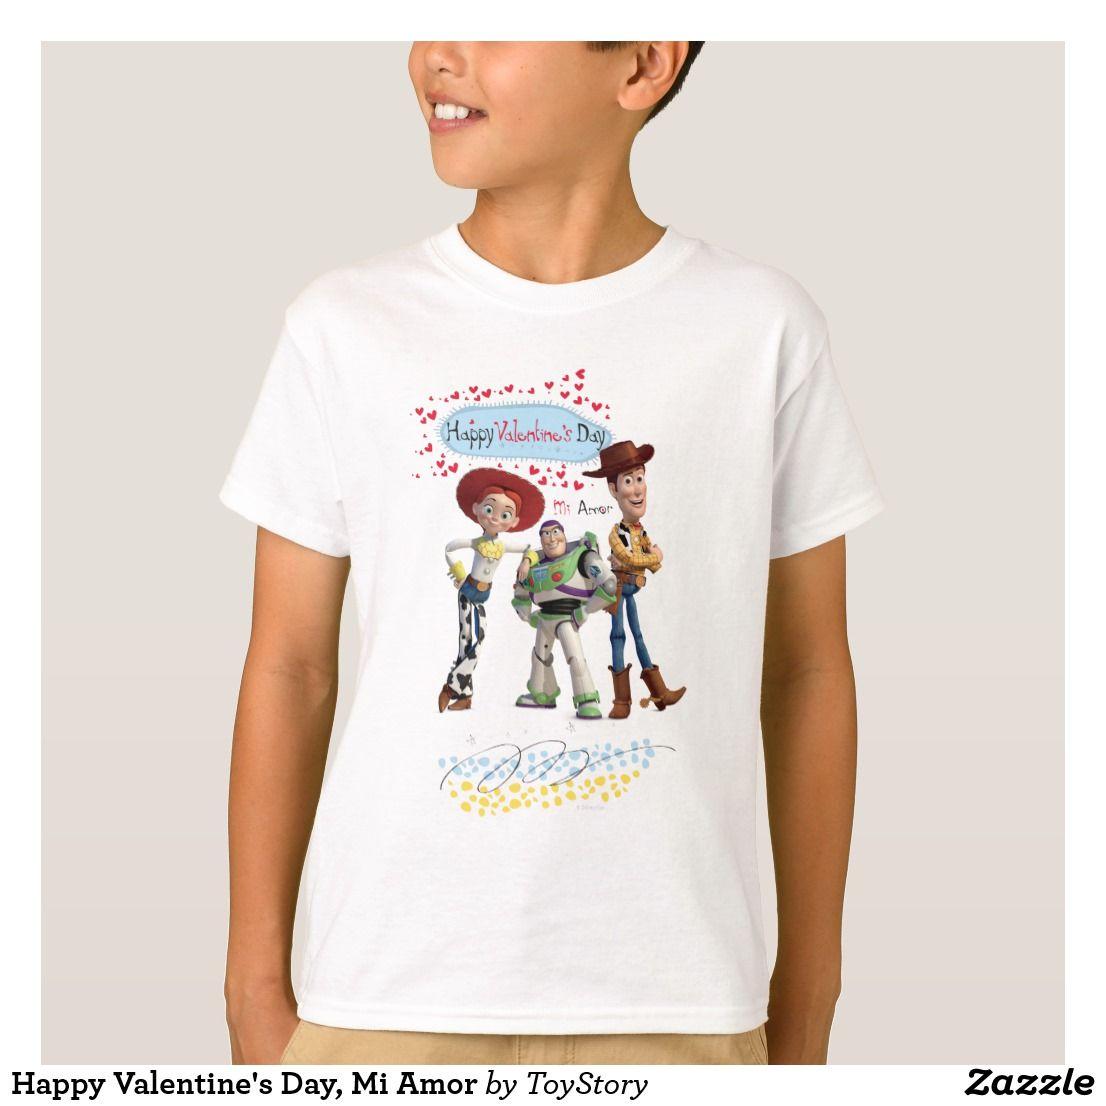 Happy Valentine's Day, Mi Amor T-Shirt